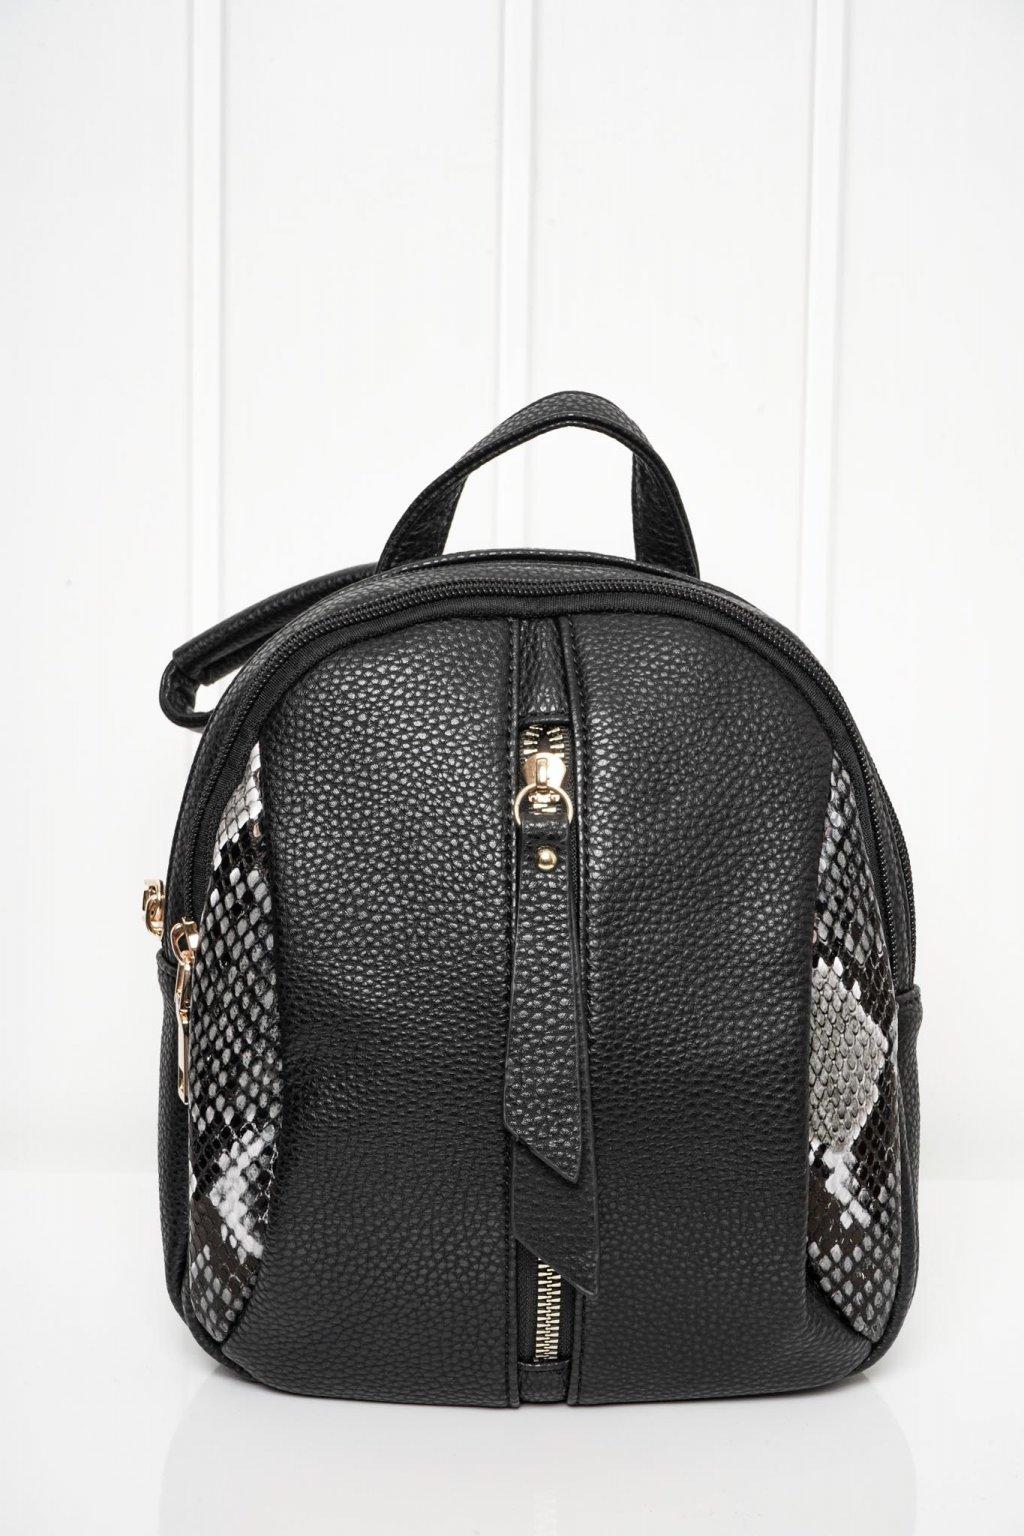 Kabelka, crossbody, ruksak, shopping bag, shopperka, 391